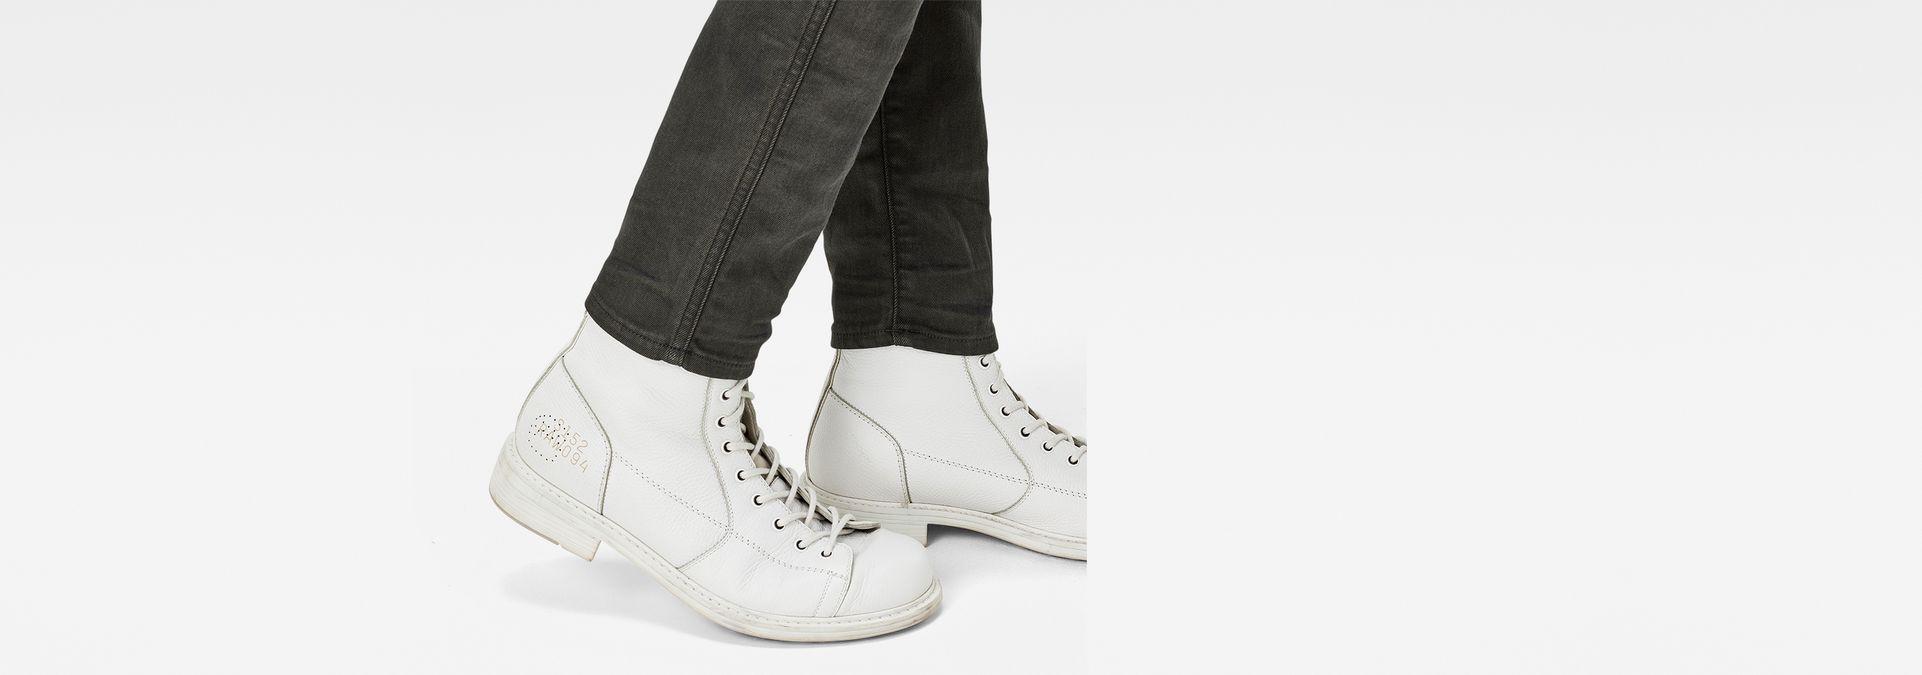 206799ff8ce Powel Super slim Color Jeans   Asfalt   Men   G-Star RAW®